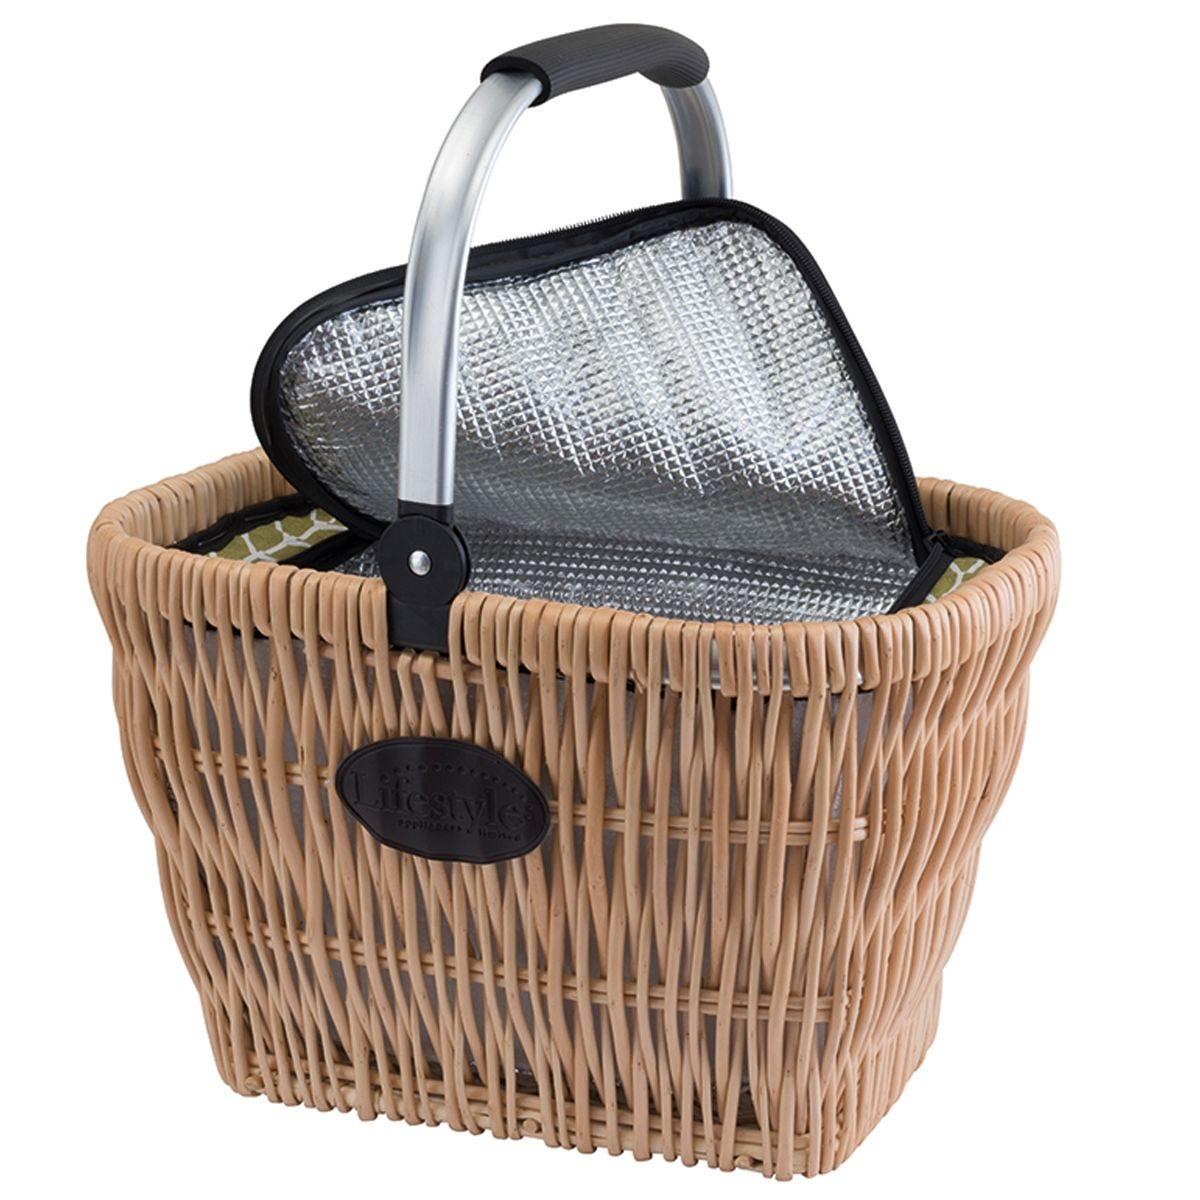 Willow Cooler Picnic Basket